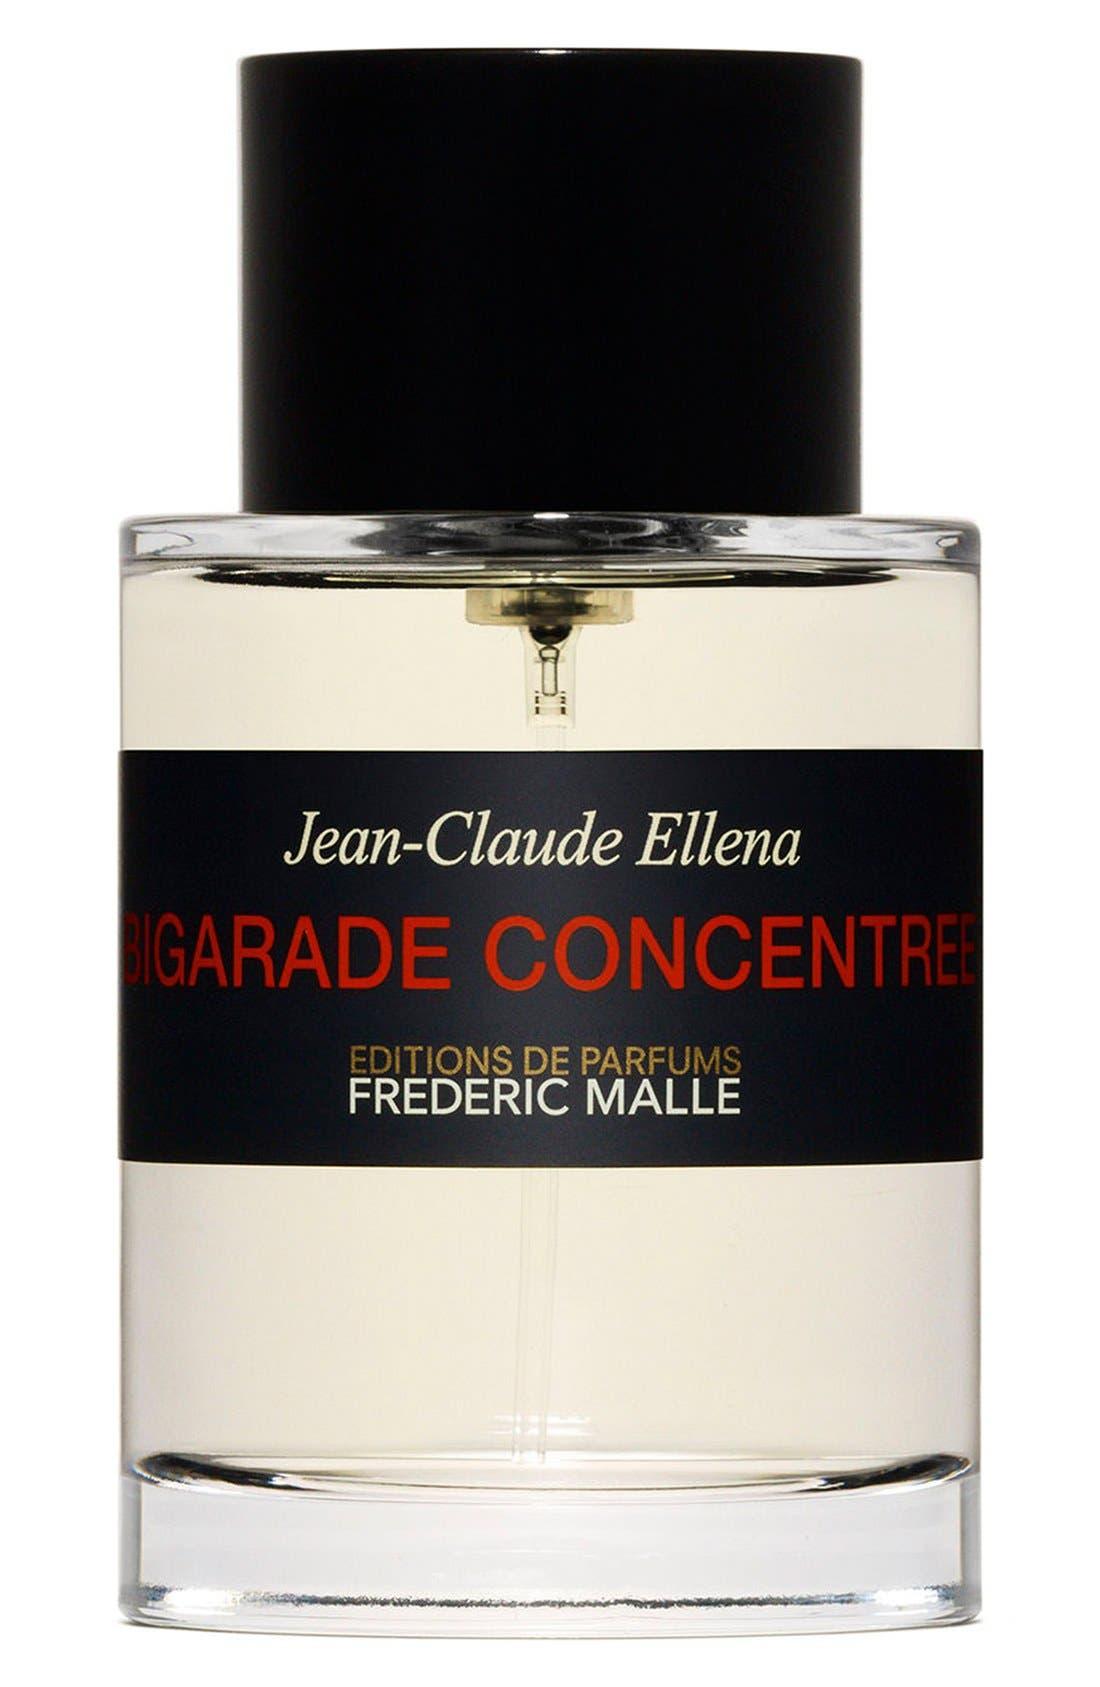 Editions de Parfums Frédéric Malle Bigrade Concentrée Parfum Spray